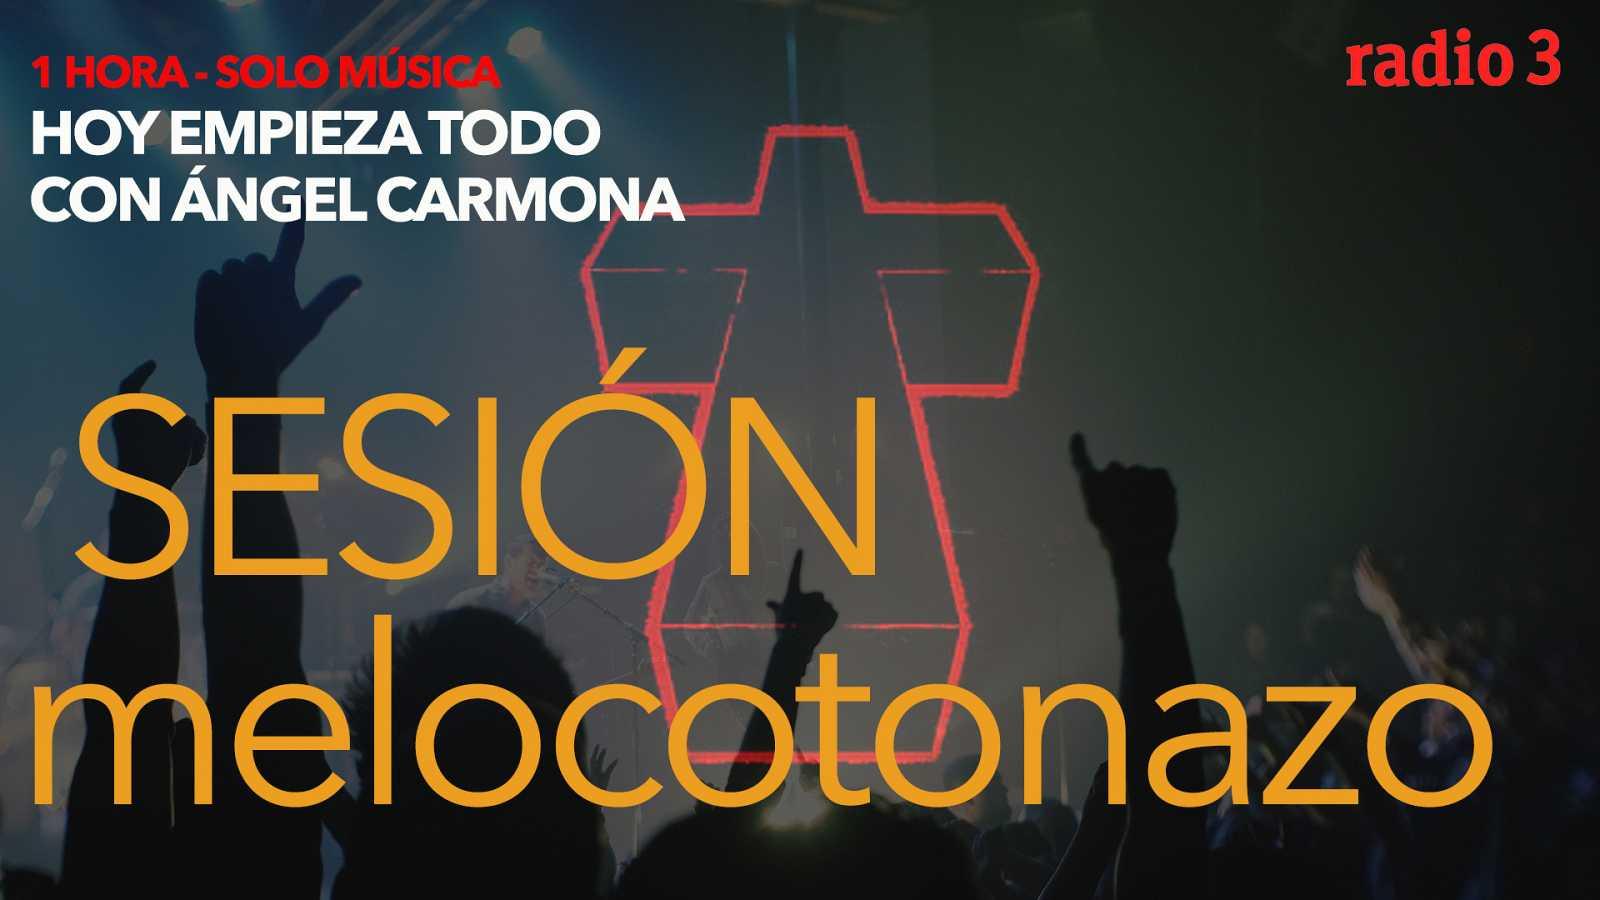 Hoy empieza todo con Ángel Carmona - #SesiónMelocotonazo: Justice, Midnight oil, Julien Baker... - 16/04/21 - escuchar ahora